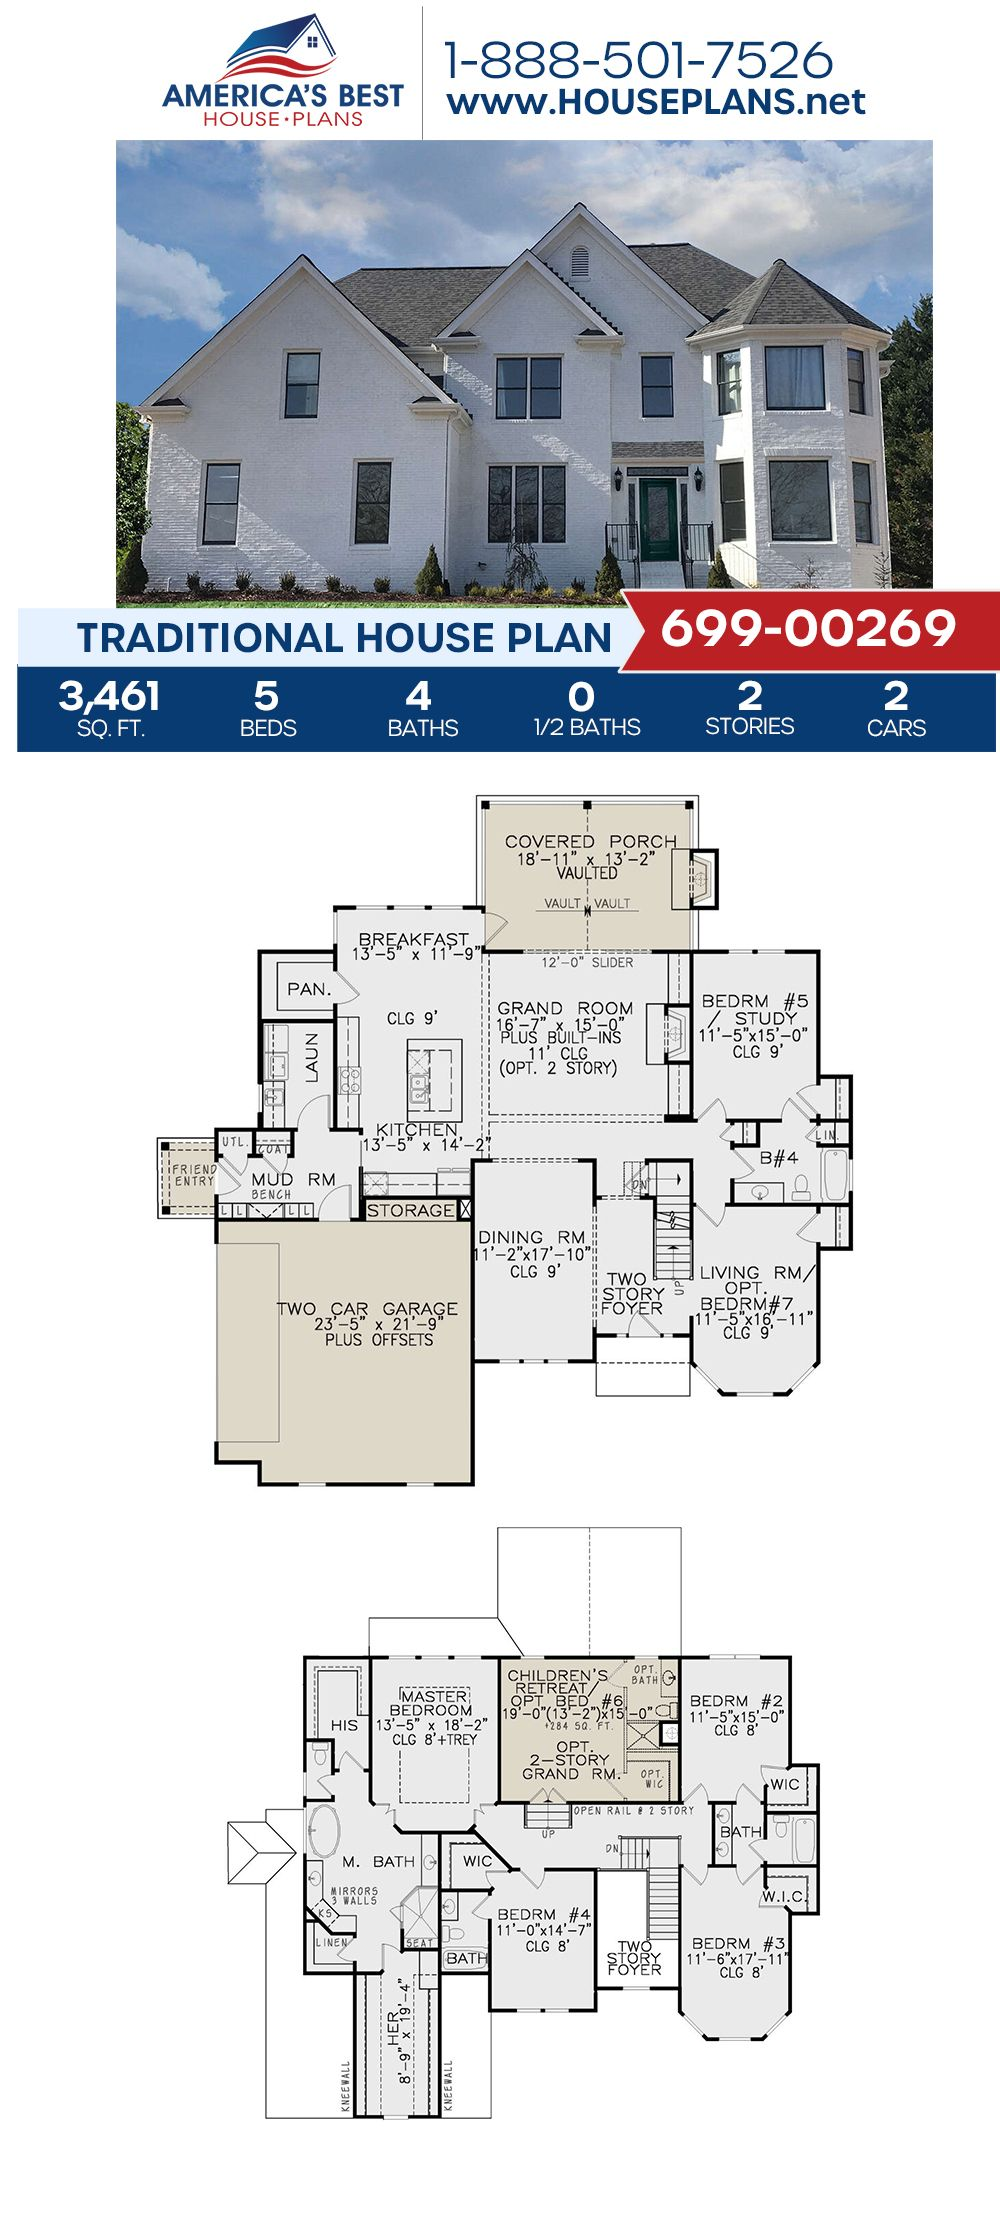 House Plan 699 00269 Traditional Plan 3 461 Square Feet 5 Bedrooms 4 Bathrooms Traditional House Plan Traditional House Traditional House Plans